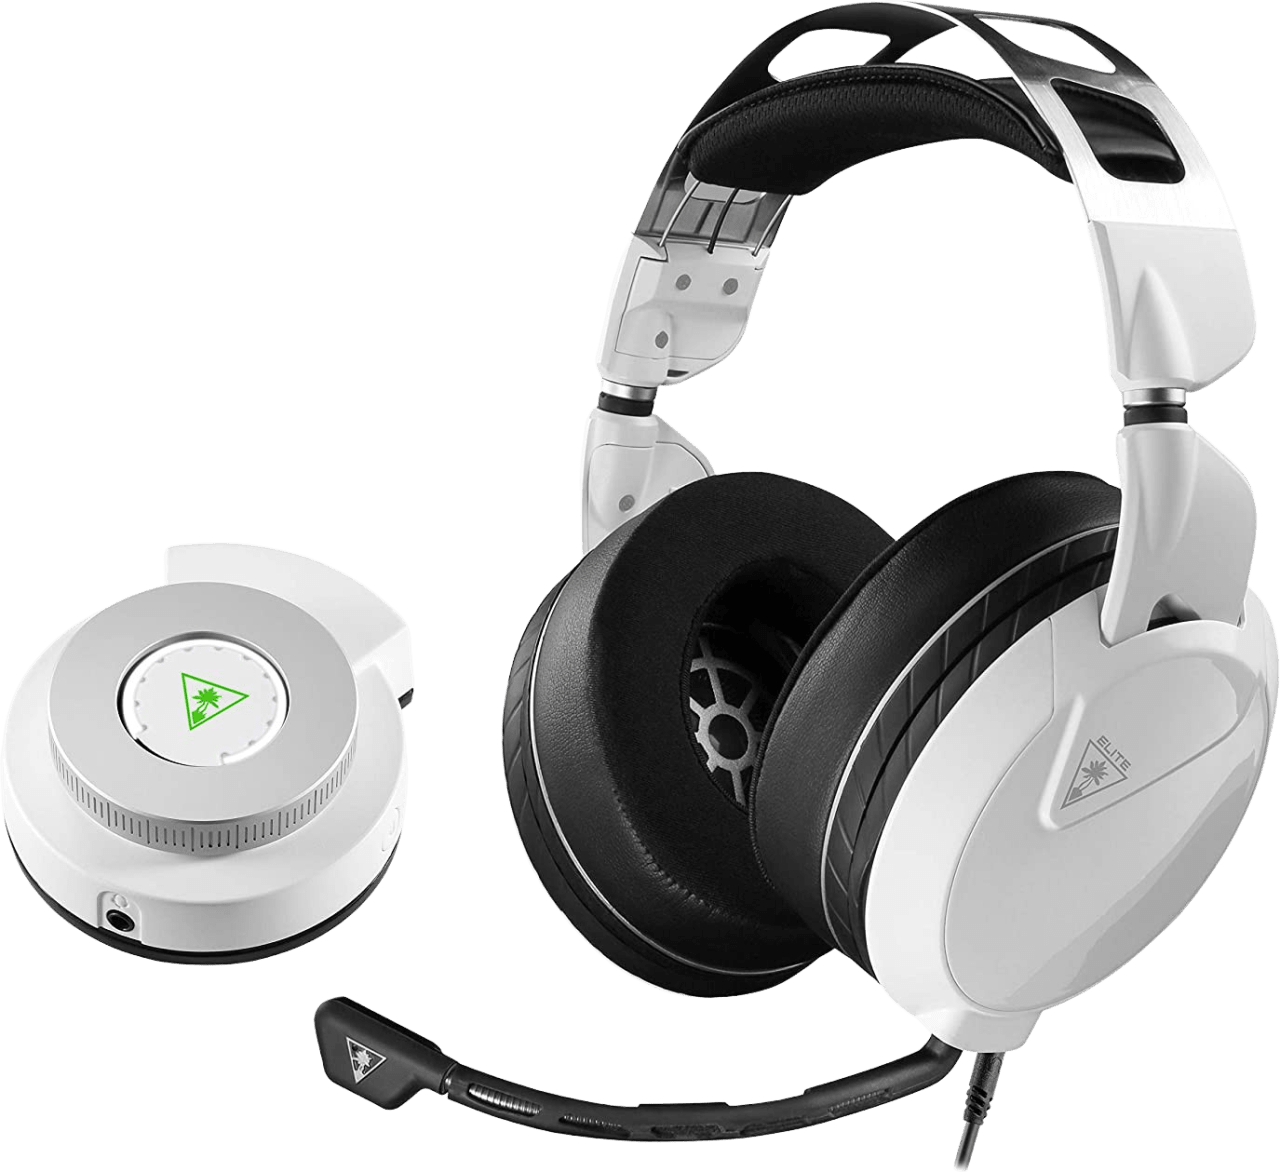 White / Black Turtle Beach Elite Pro 2 + SuperAmp (Xbox) Over-ear Gaming Headphones.1